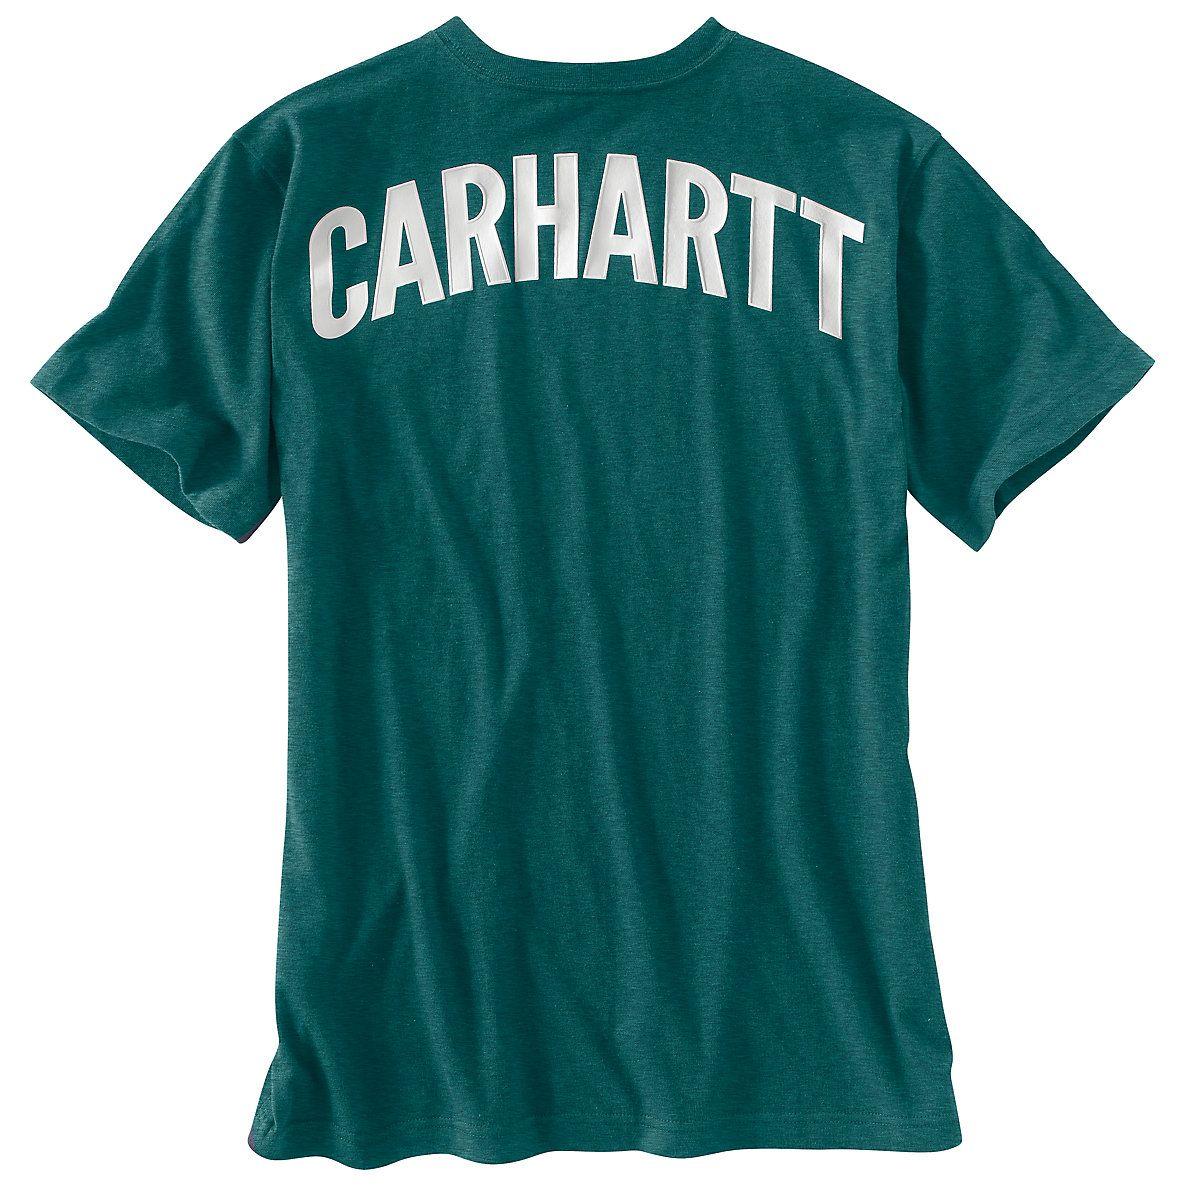 Men's, Relaxed Fit, Short-Sleeve, Carhartt Graphic T-Shirt